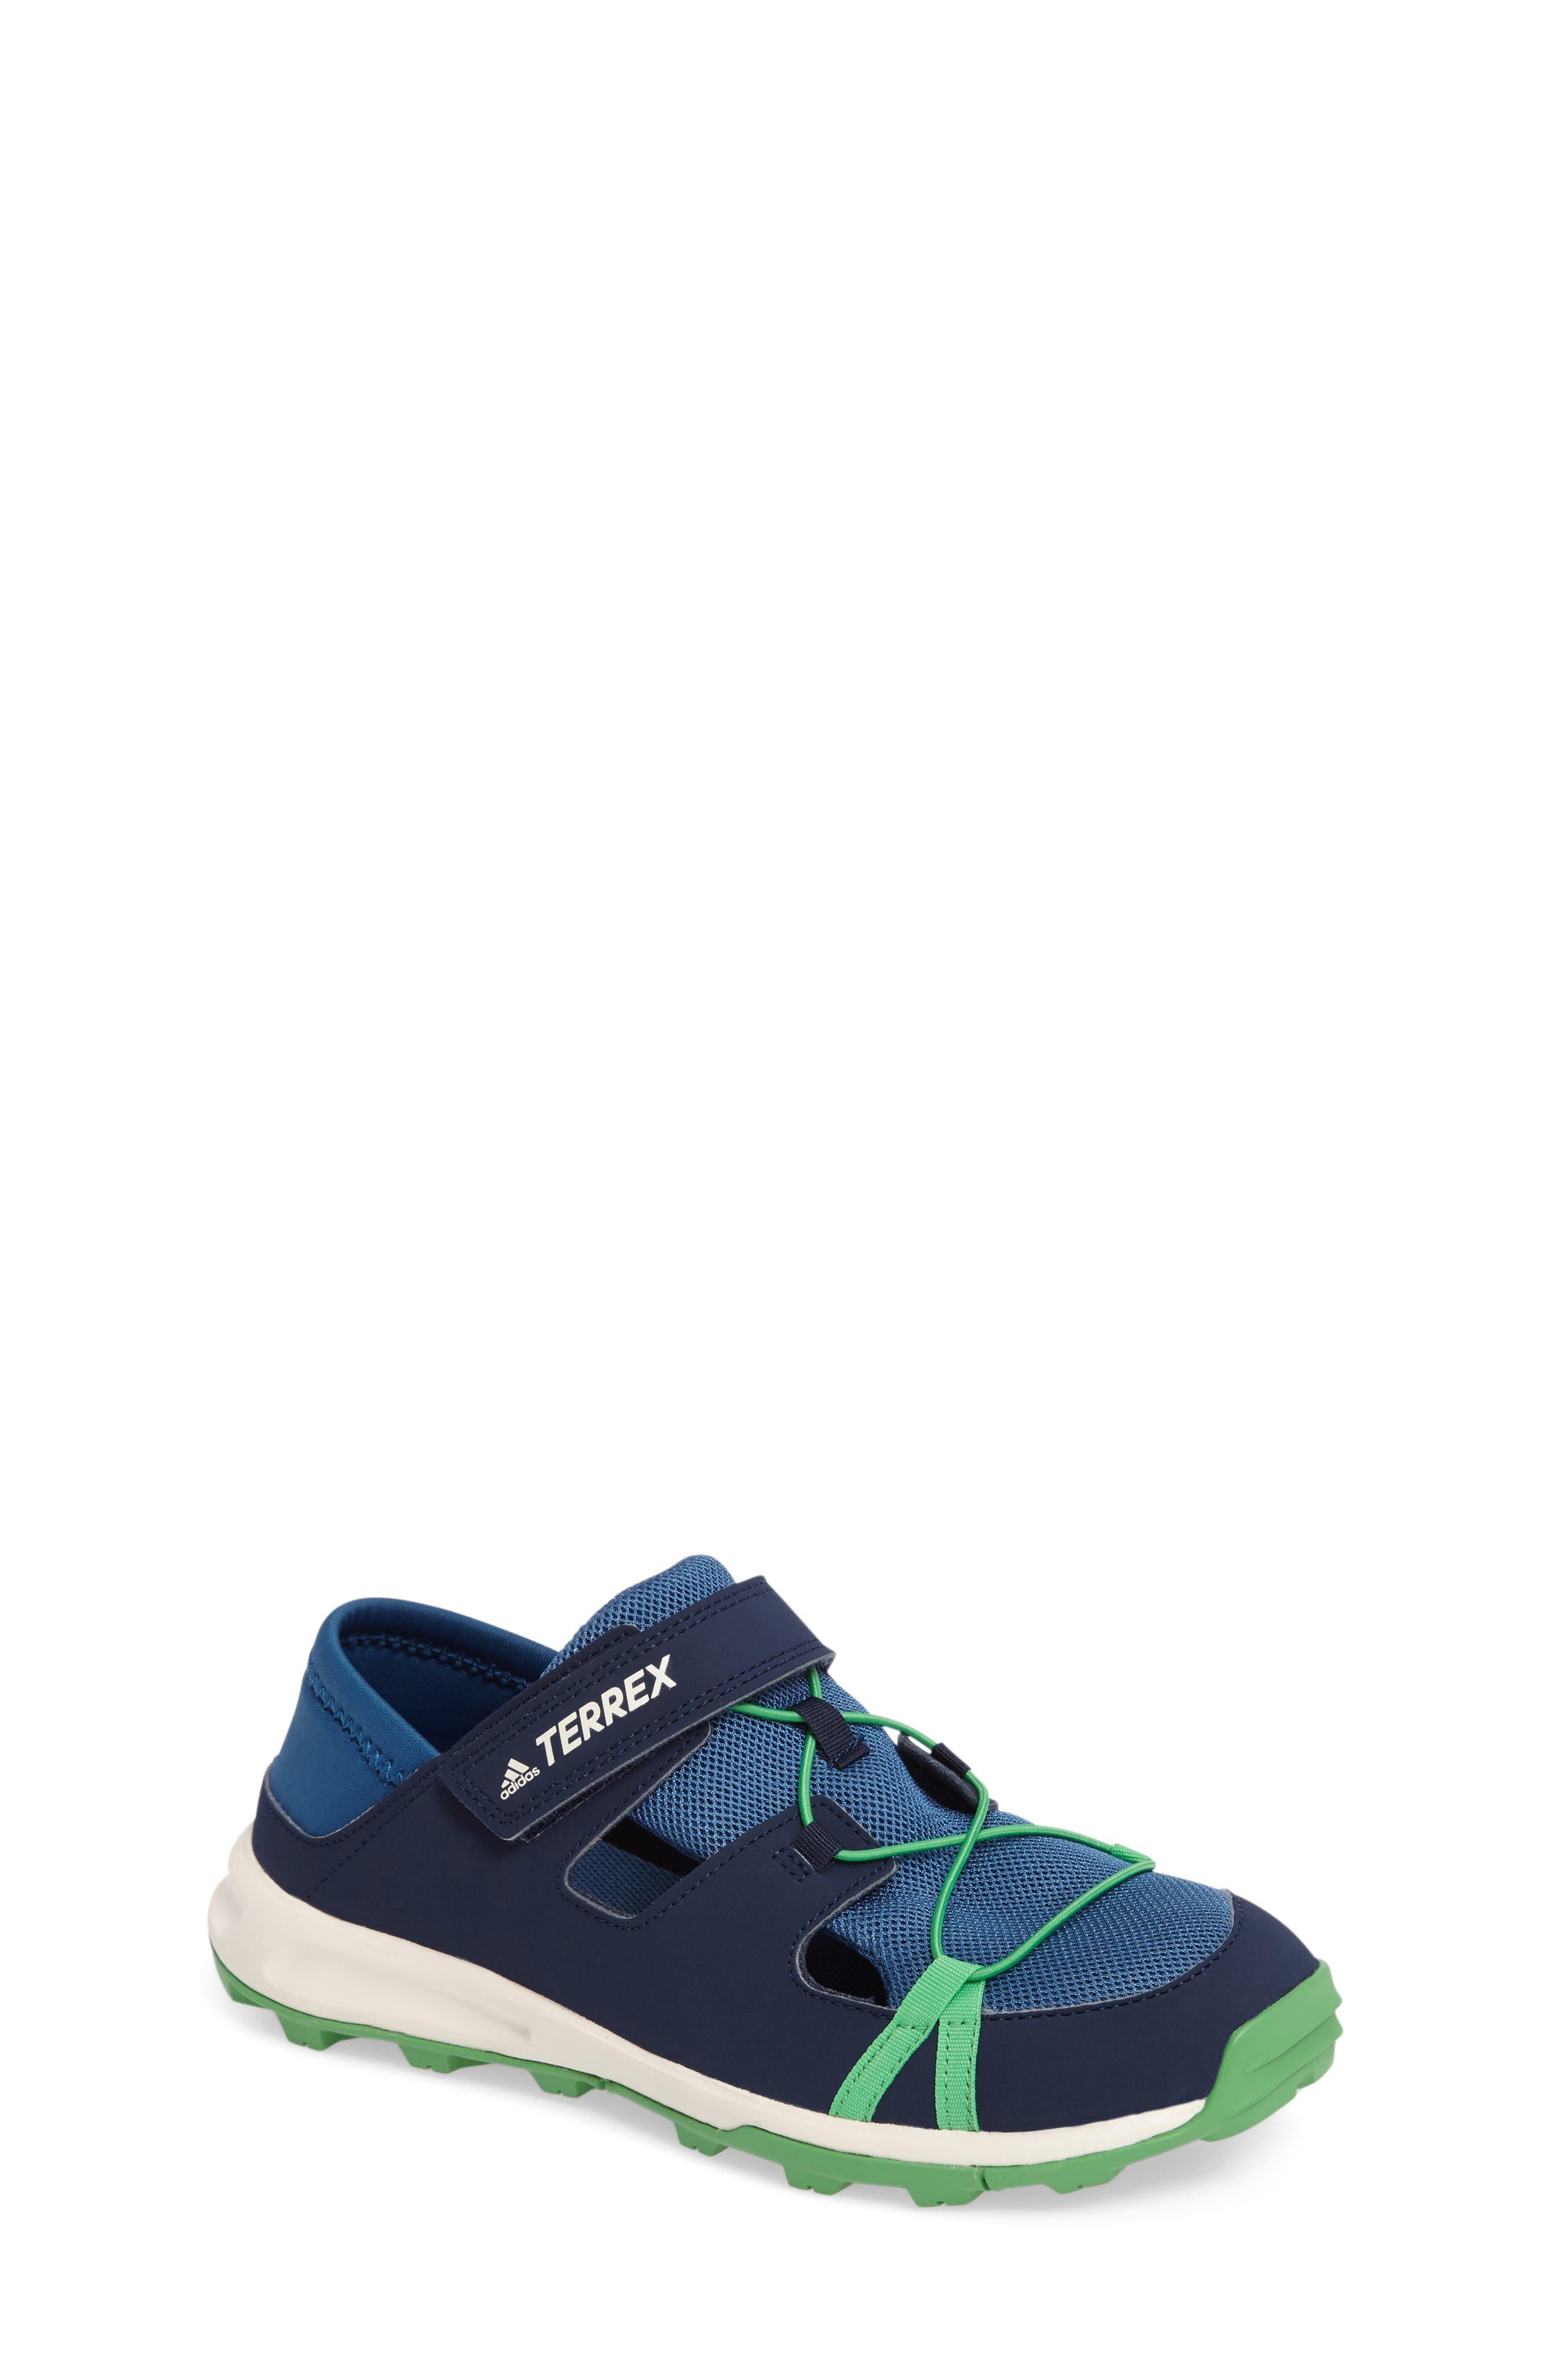 Terrex Tivid Sneaker,                         Main,                         color, 420